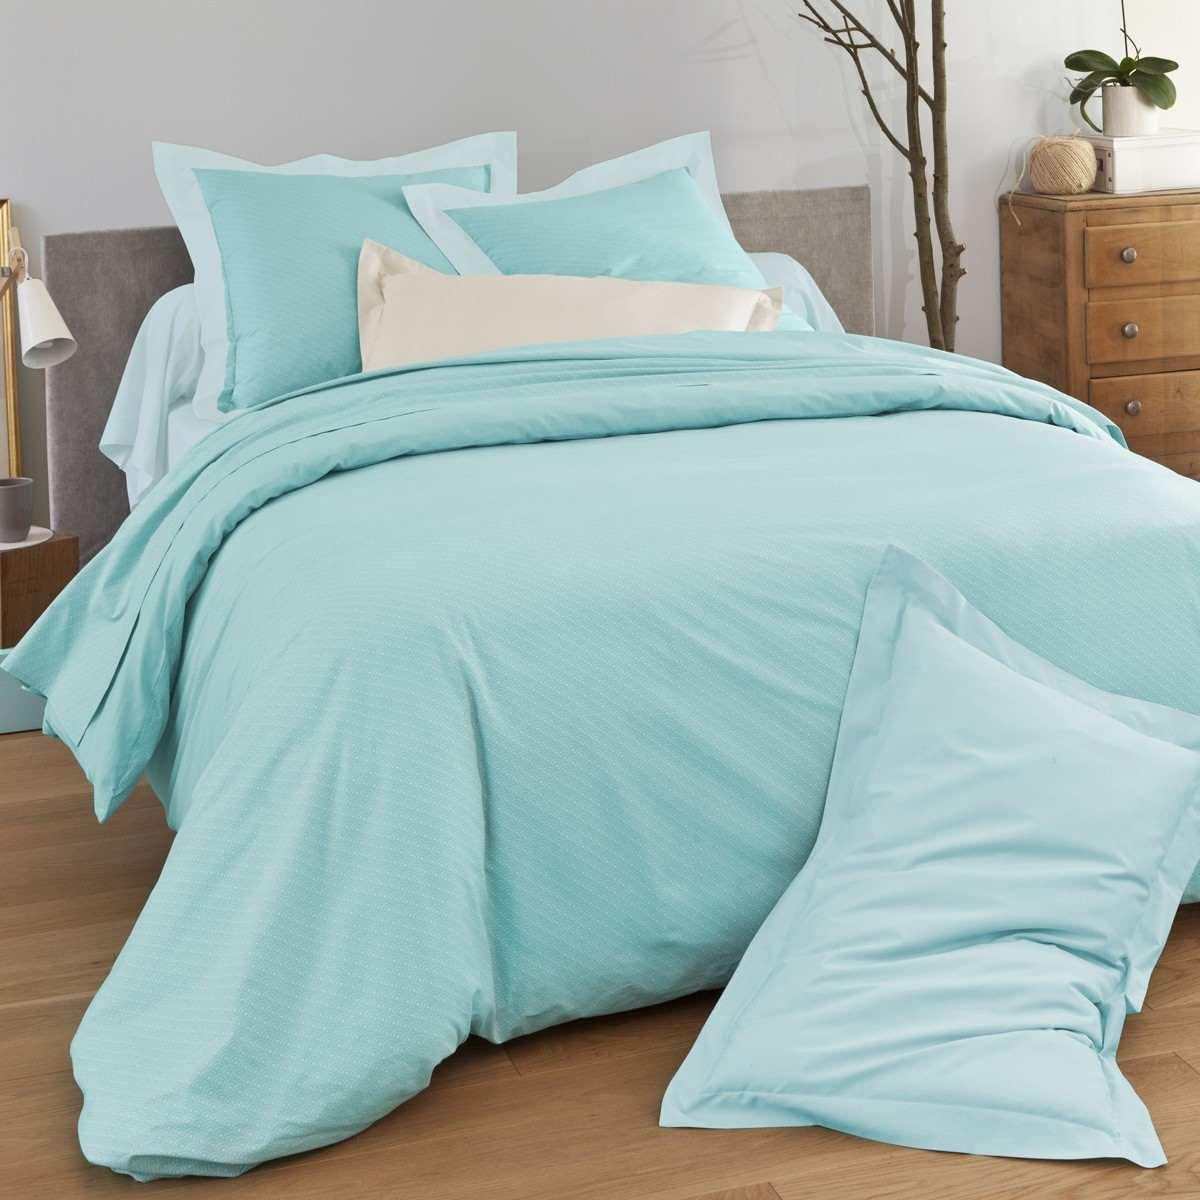 Flat Sheet Bed Set Dream Blue | Bed linen | Tradition des Vosges